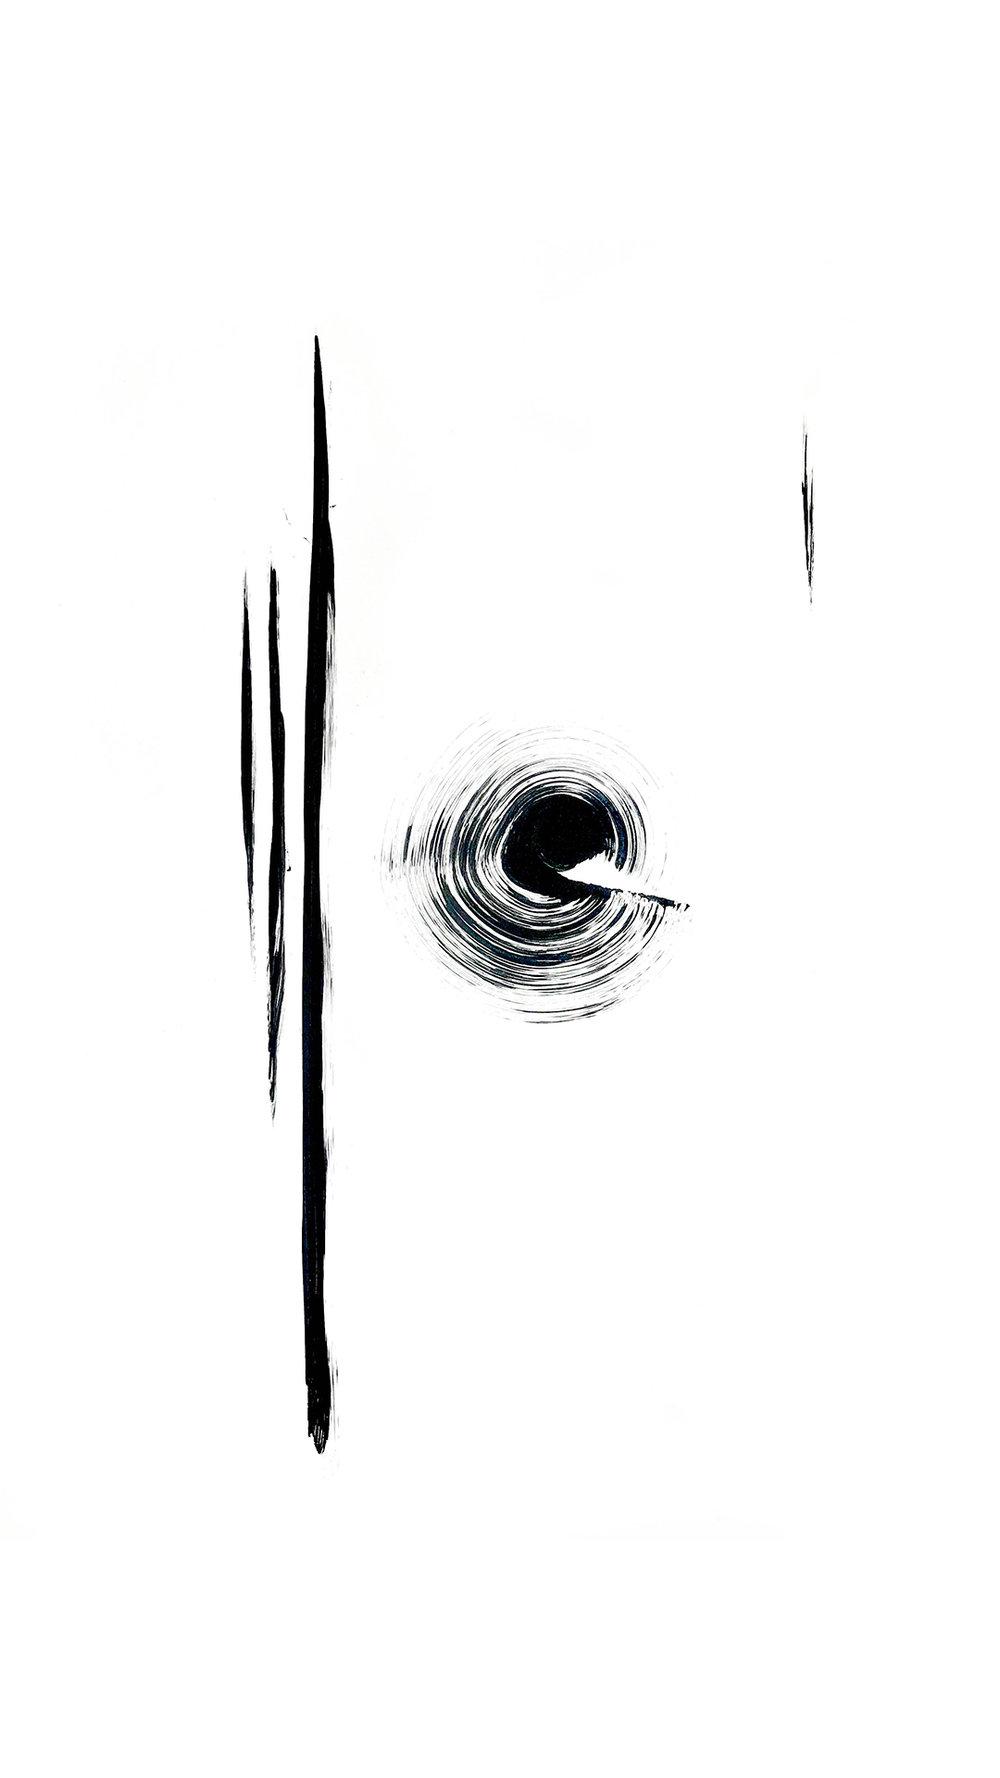 Untitled-8.jpg